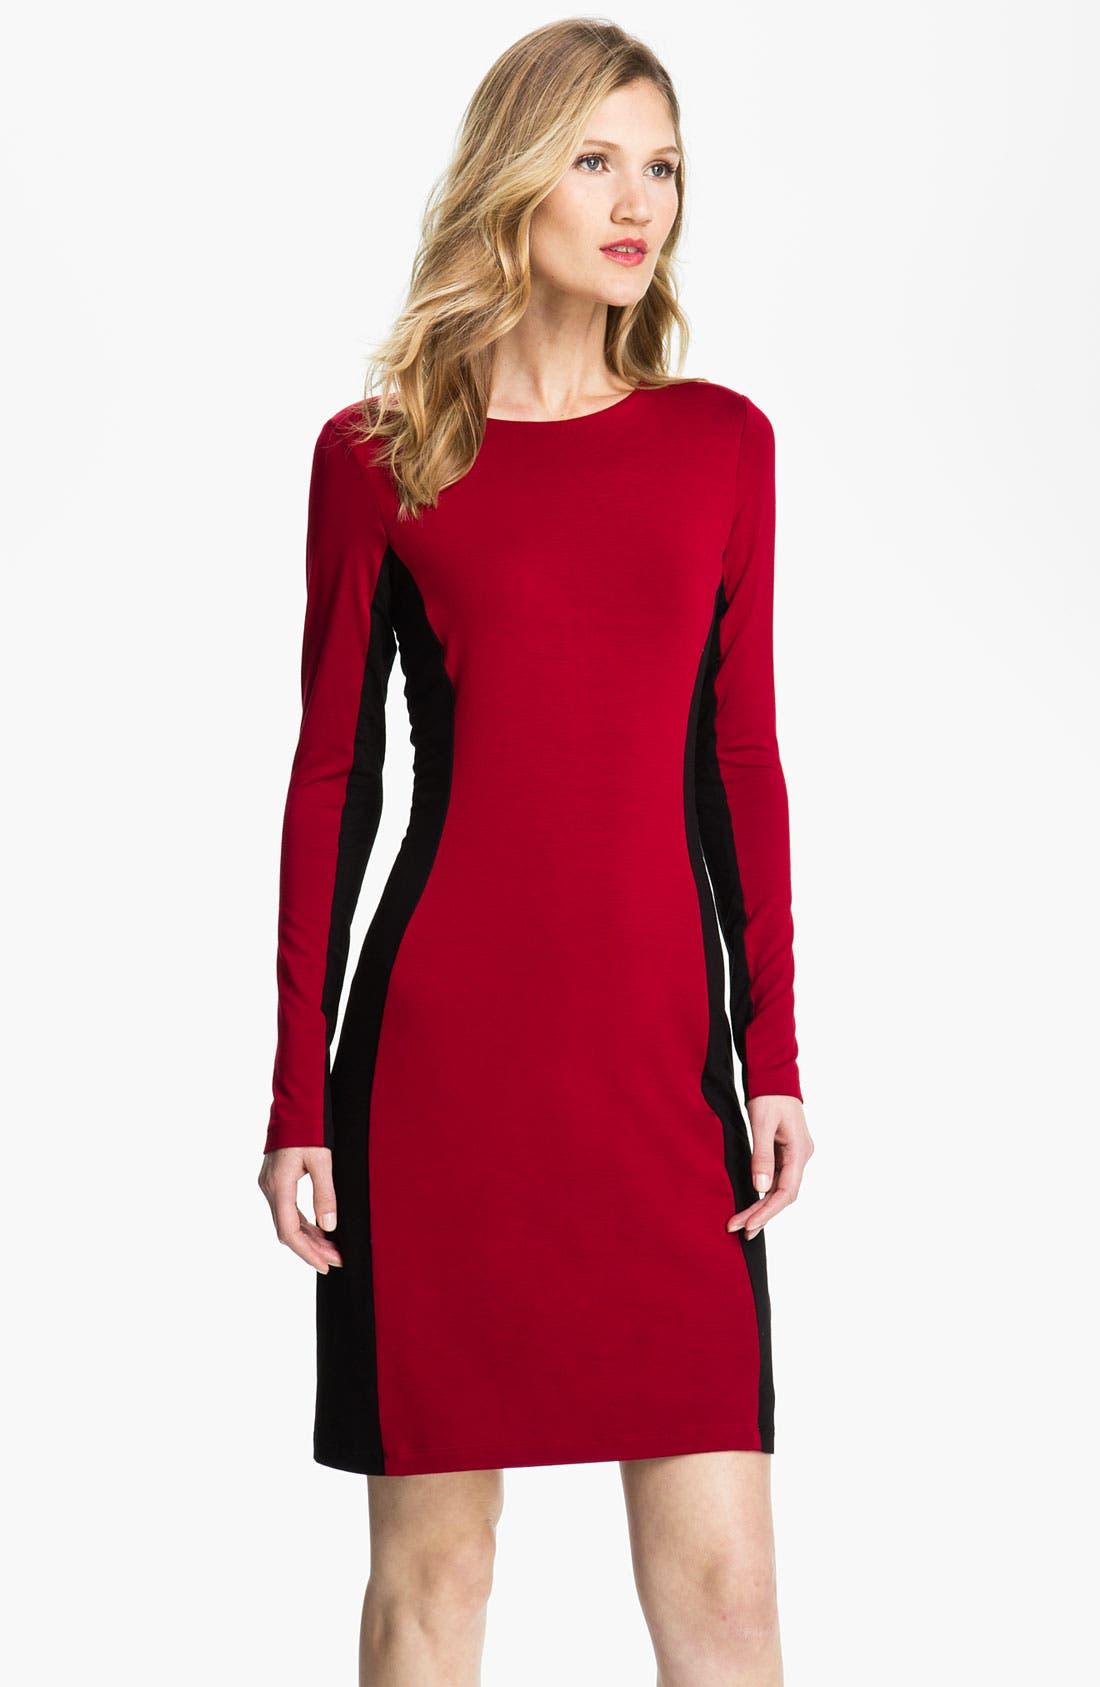 Alternate Image 1 Selected - Karen Kane Contrast Panel Dress